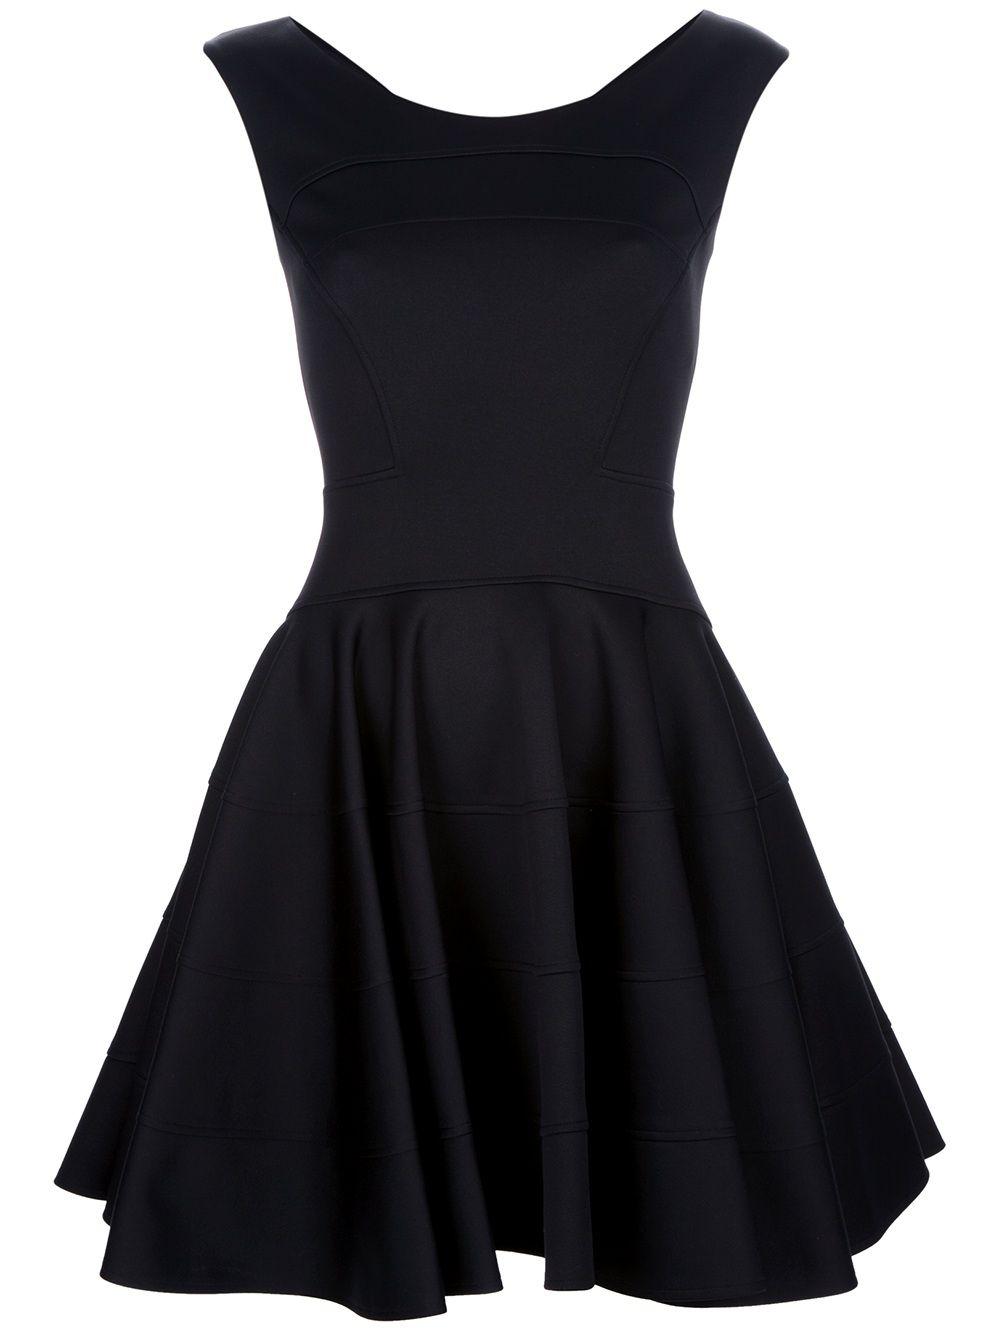 Gianni Versace Skater Dress | In my closet | Pinterest | Gianni ...